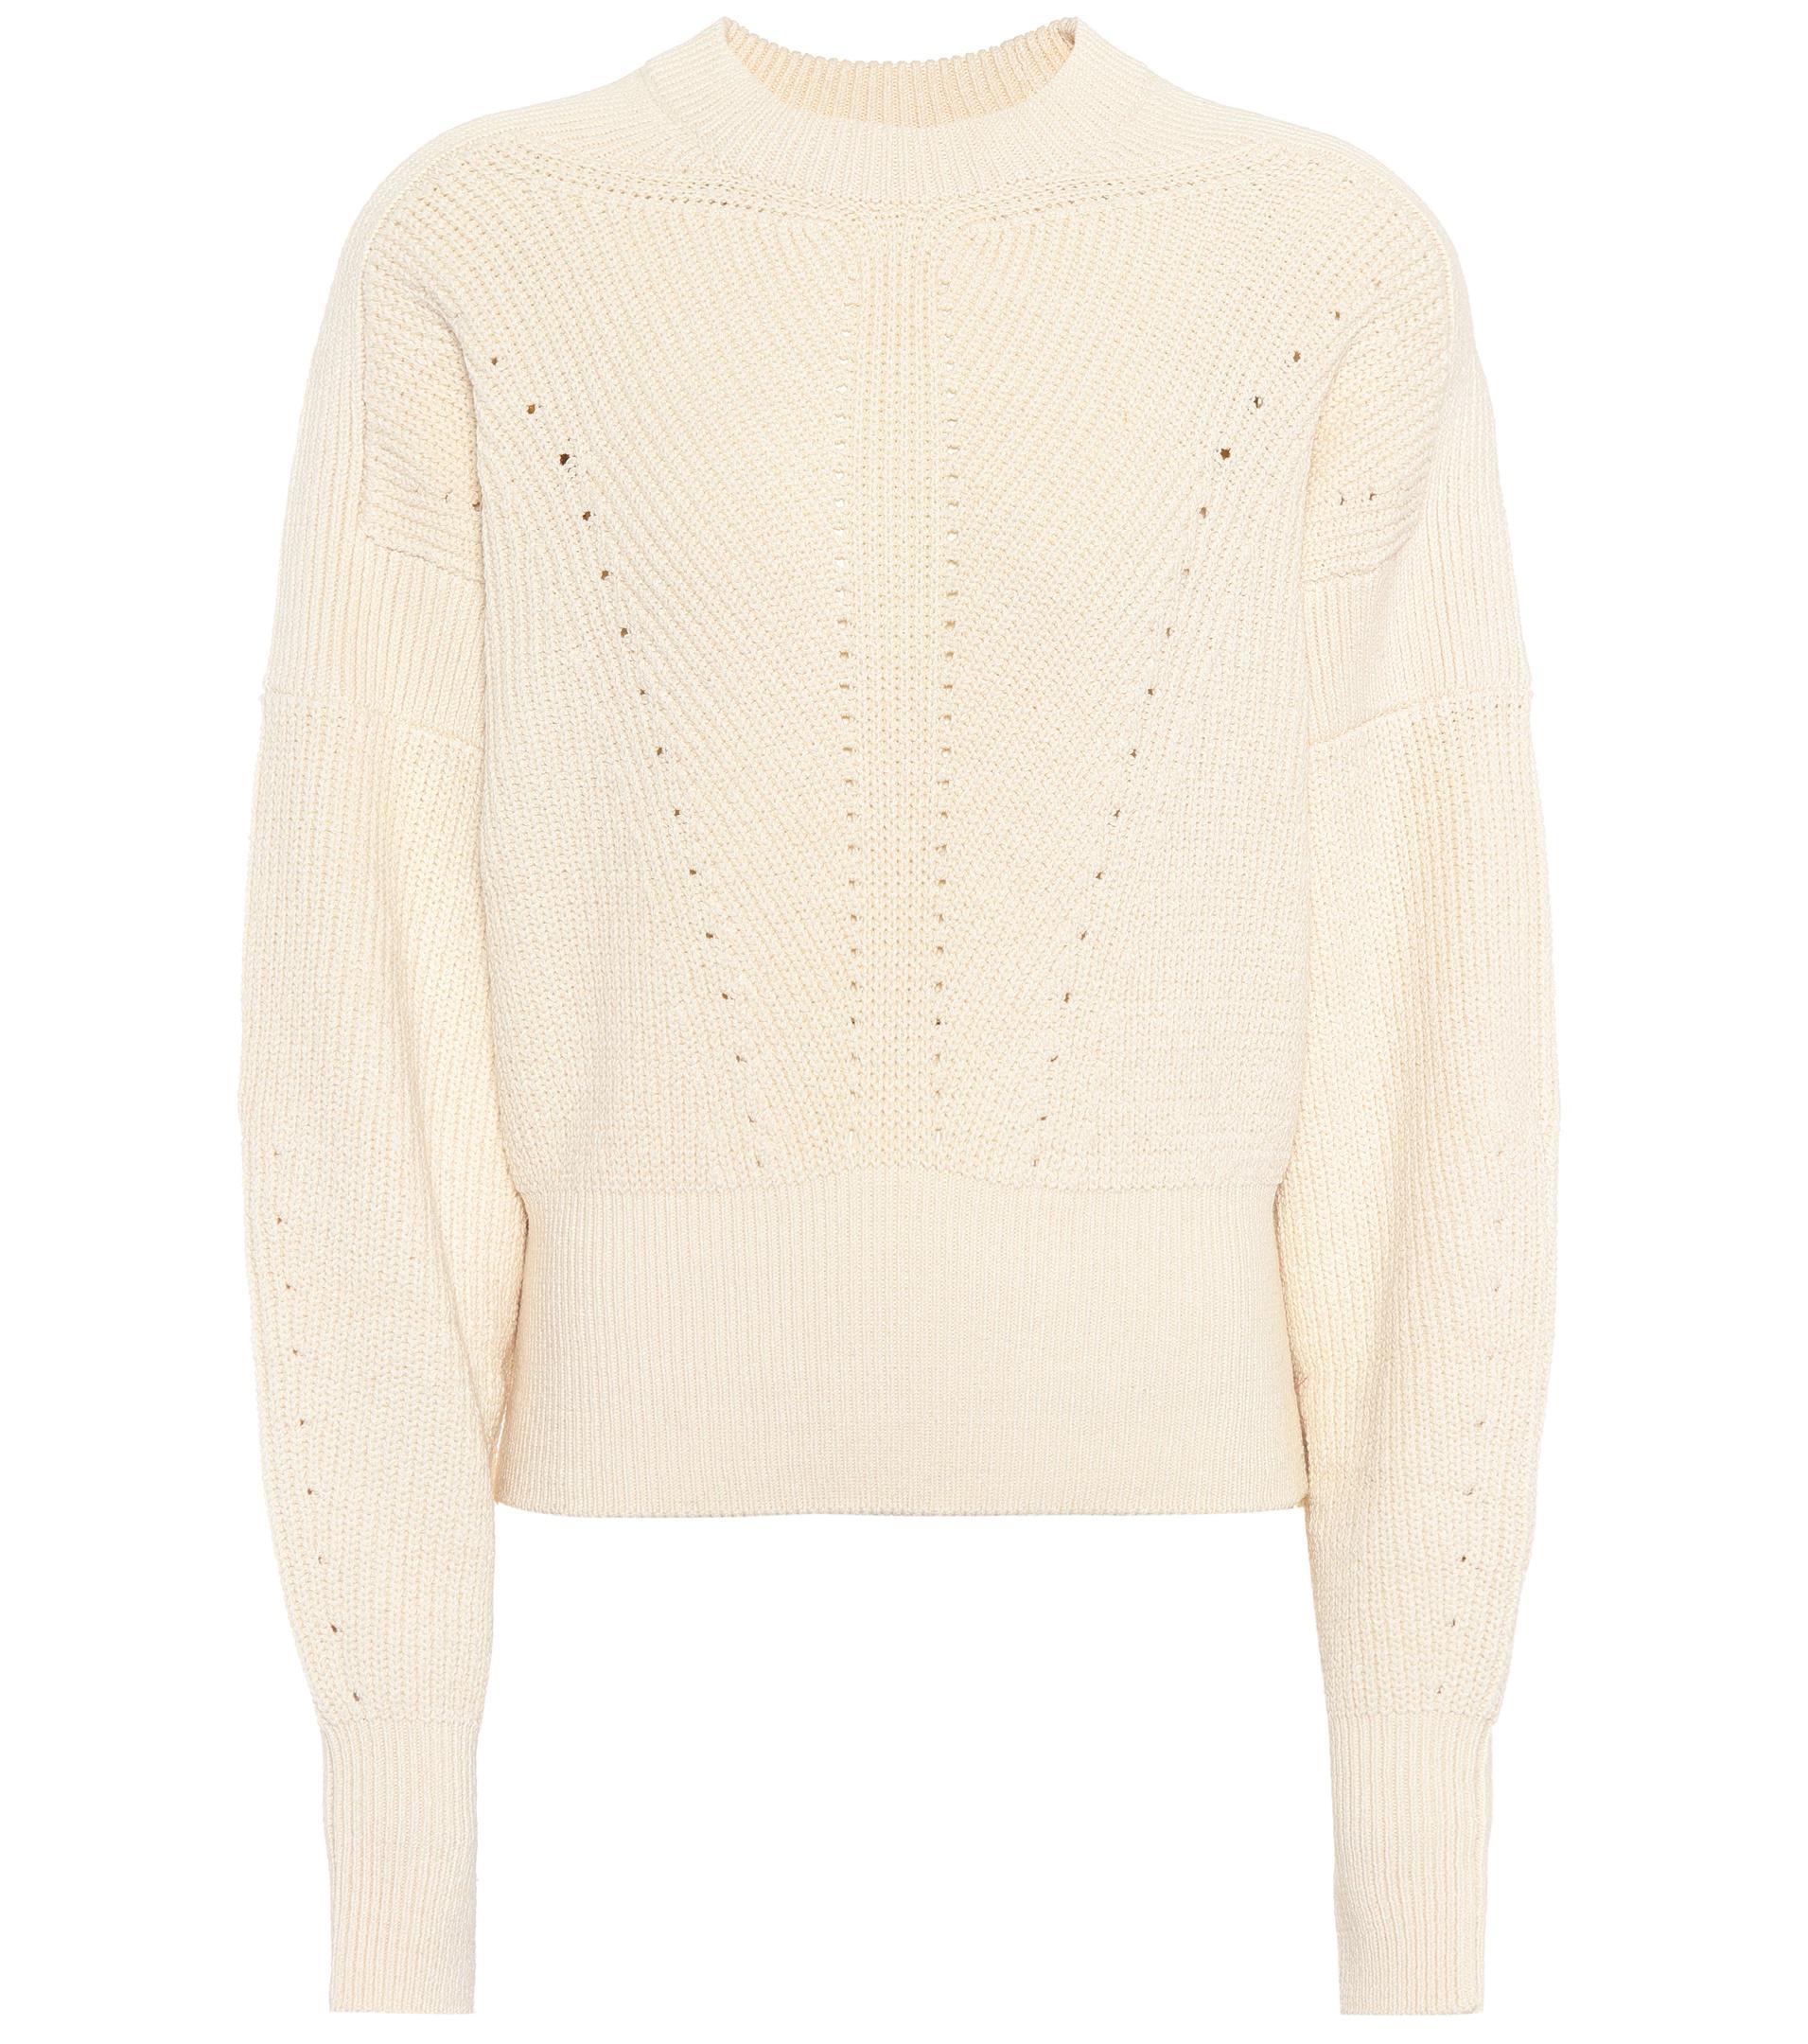 4dc609f683 Isabel Marant Lonnyl Cotton-blend Sweater in White - Lyst